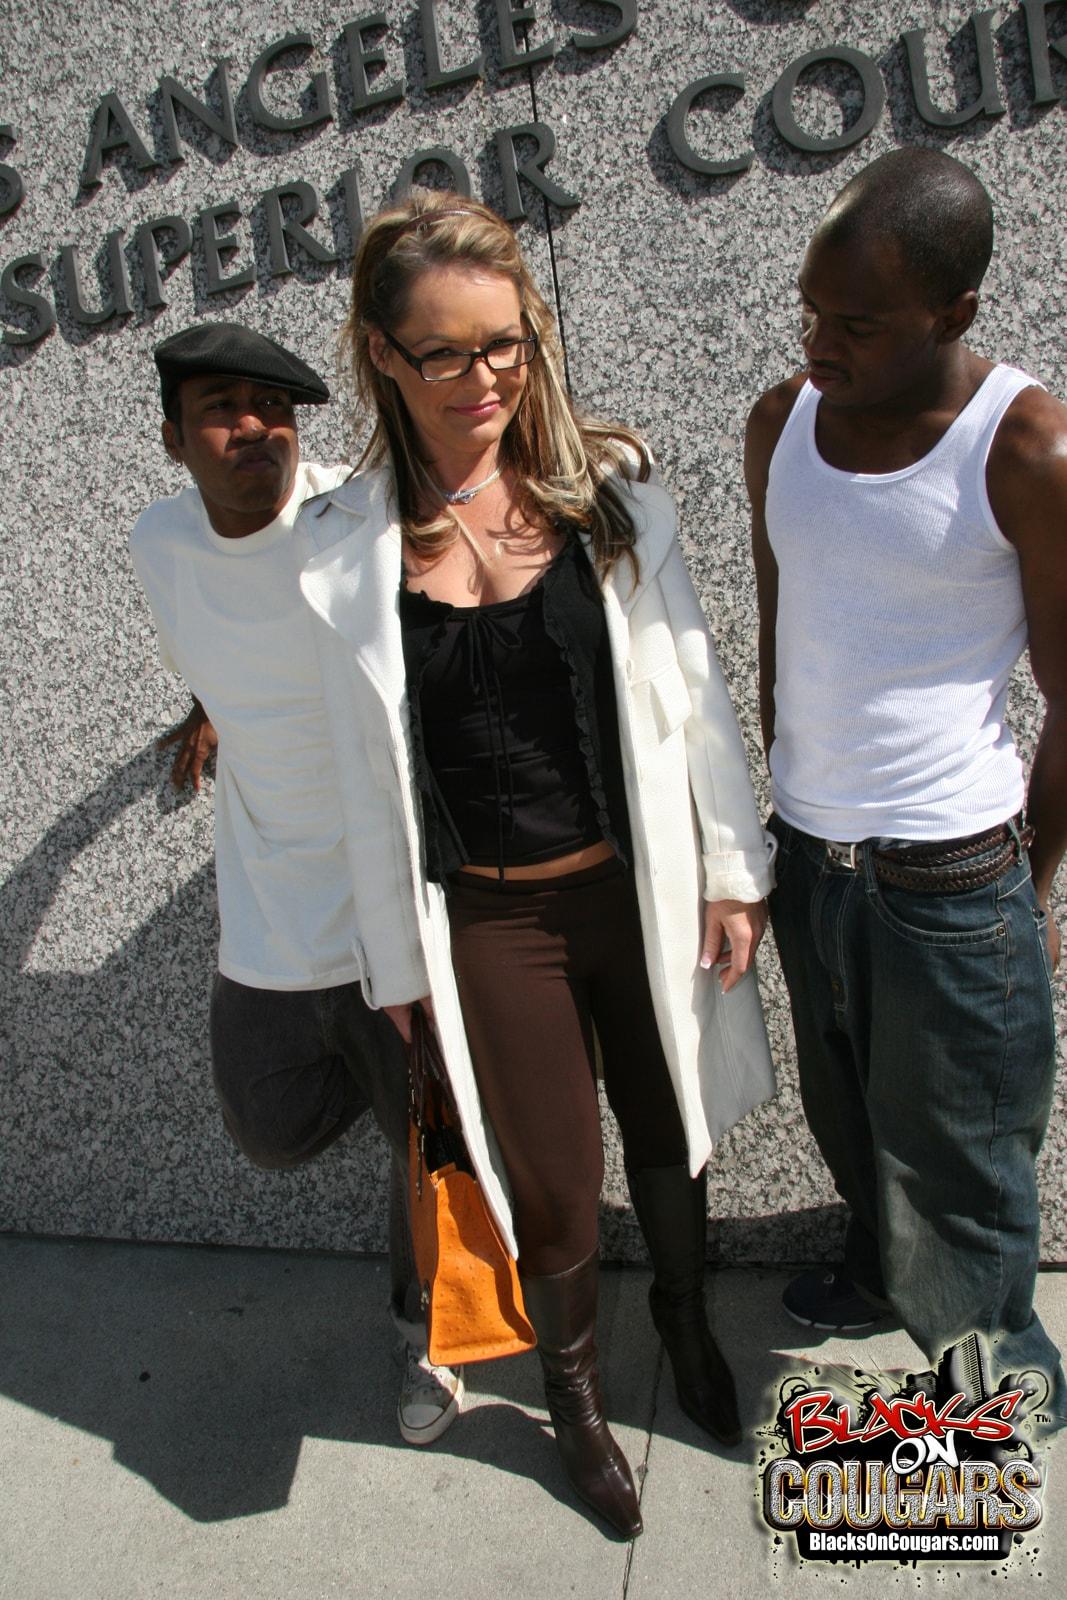 Dogfart '- Blacks On Cougars' starring Kelly Leigh (Photo 3)